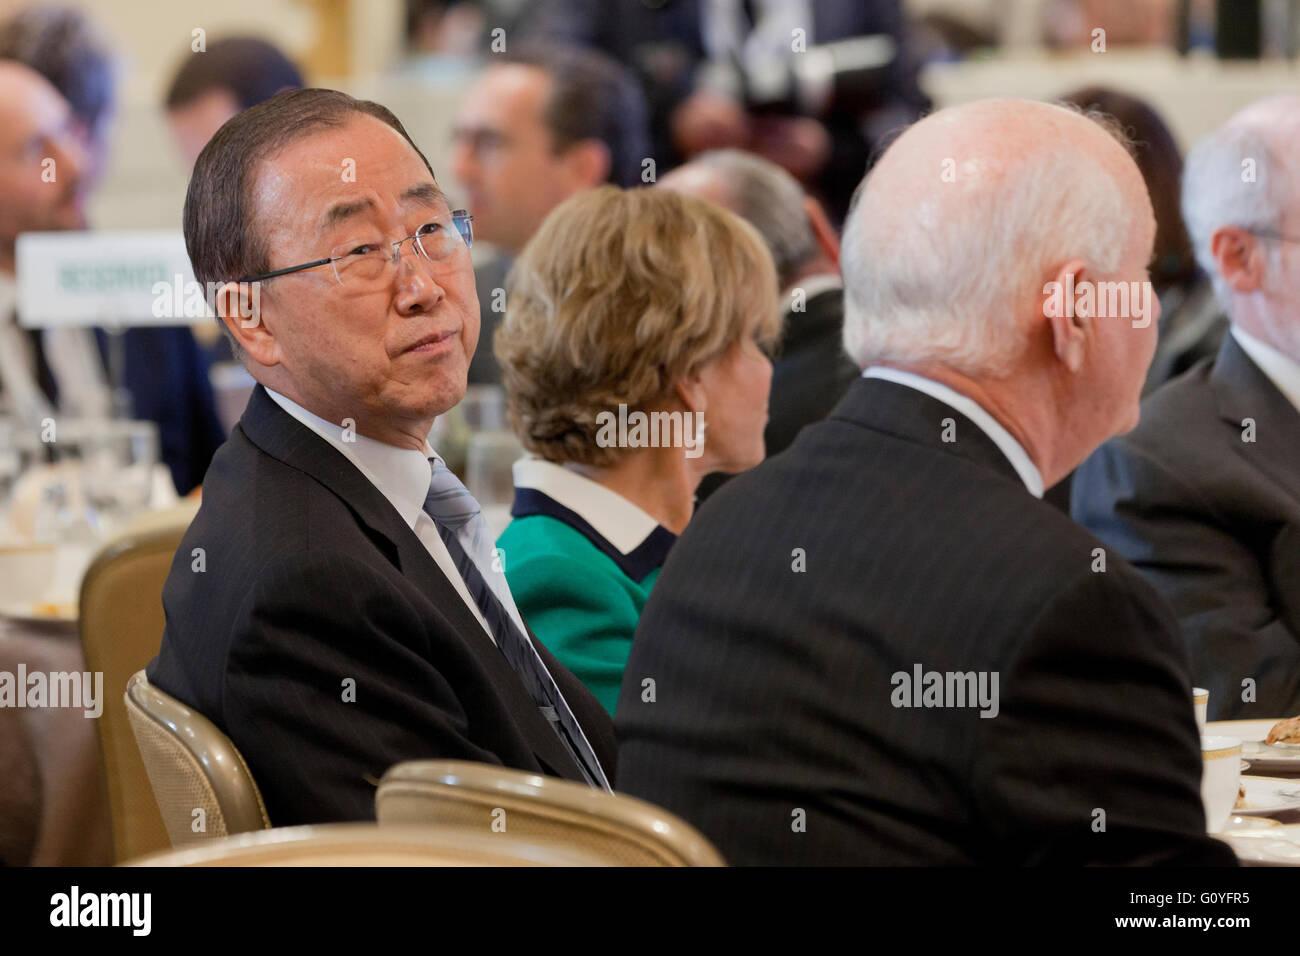 Washington, DC USA. 5th May, 2016:Climate Action 2016 Summit brings global leaders to Washington, DC.  UN Secretary Stock Photo